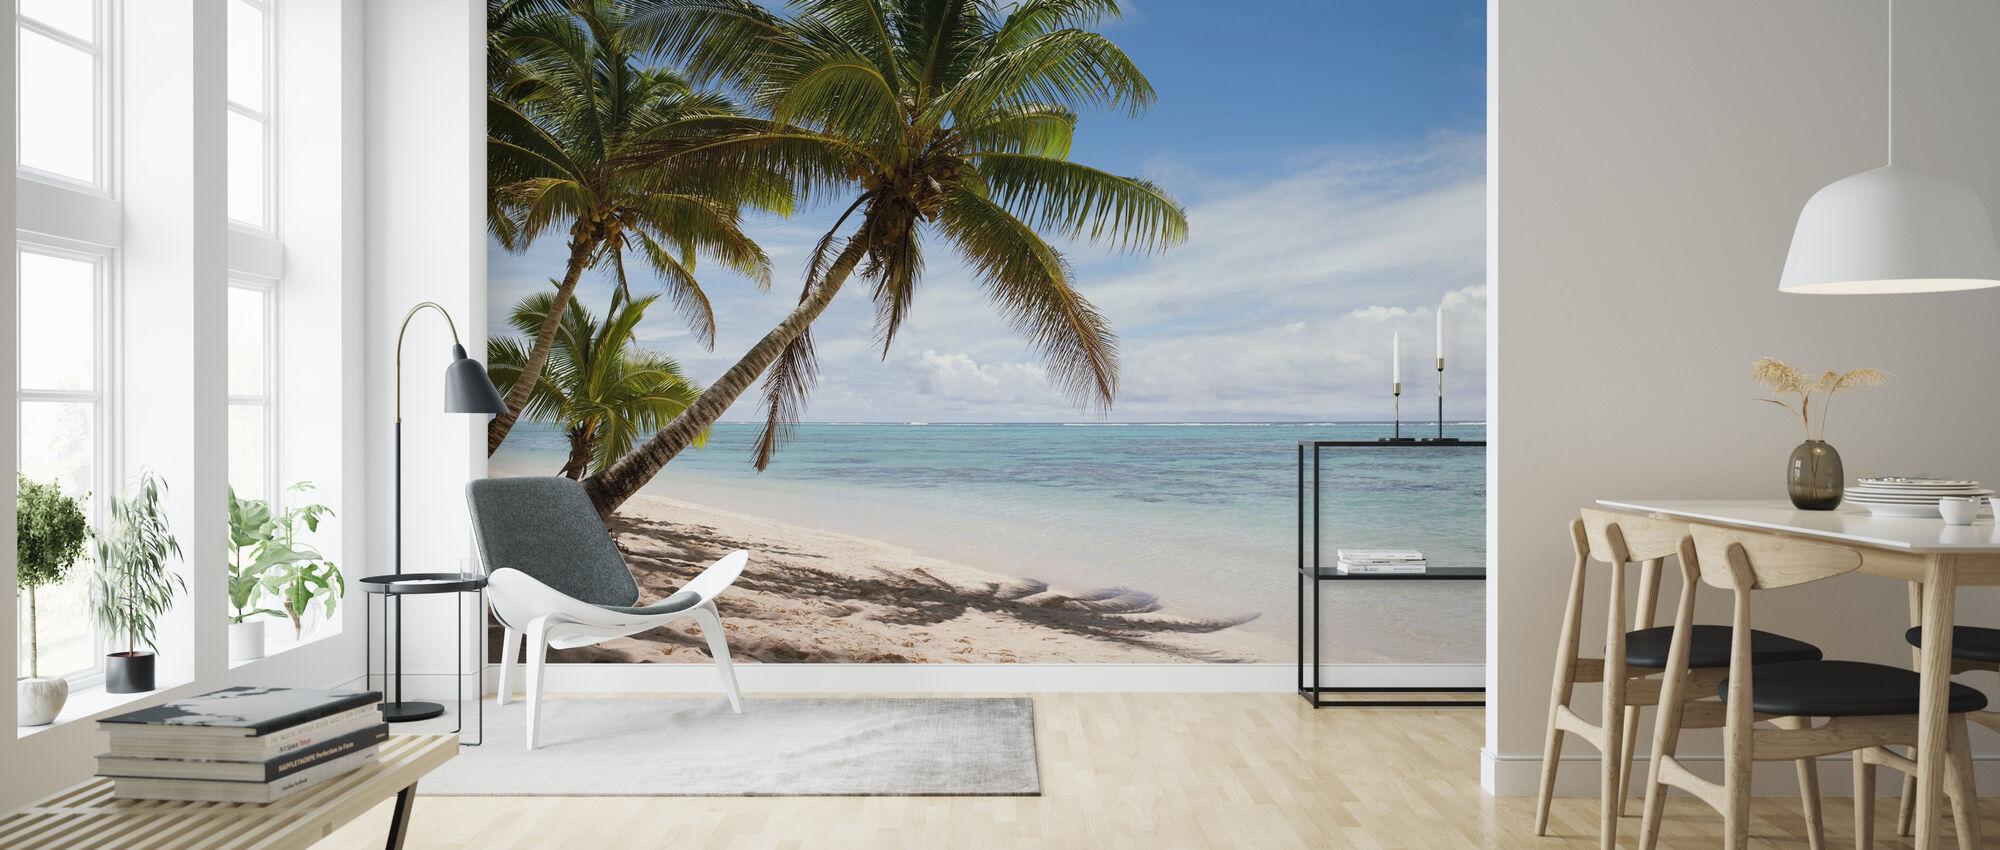 Tropical Beach Scene Wall Murals Online Photowall